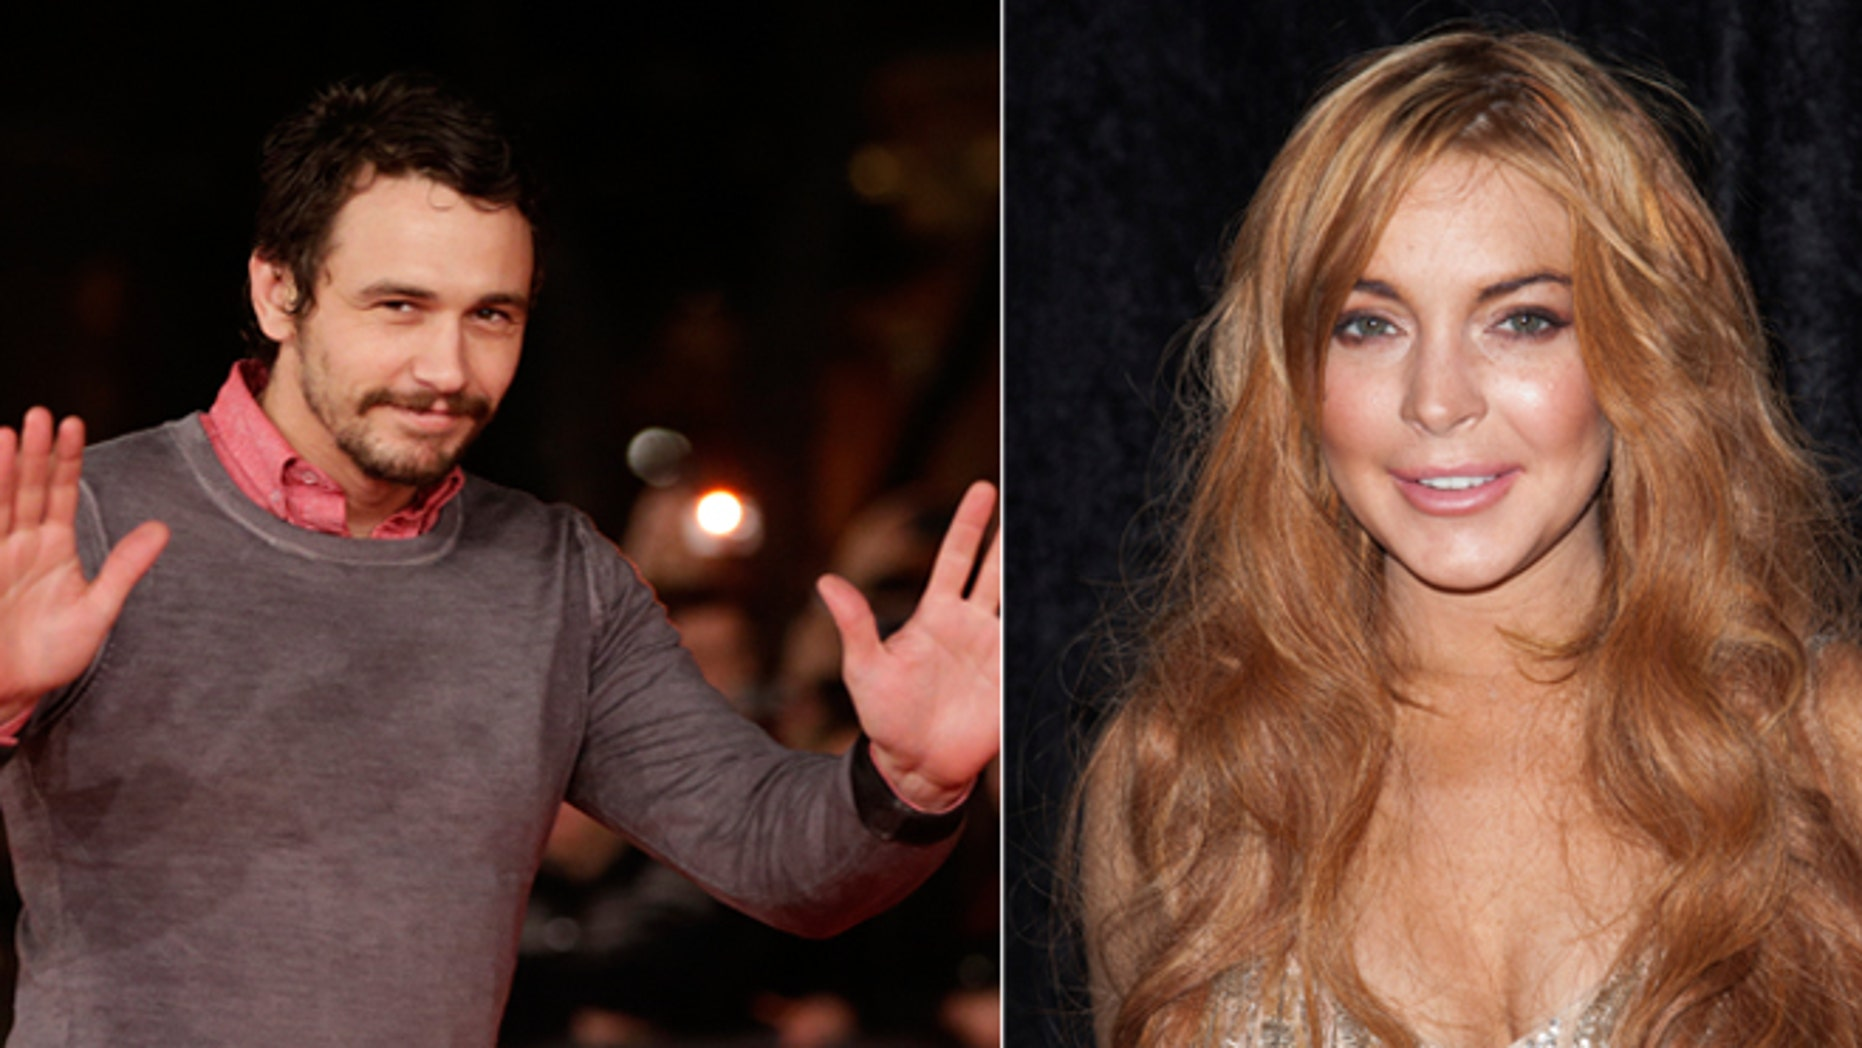 James Franco, left, said he rejected advances from starlet Lindsay Lohan.